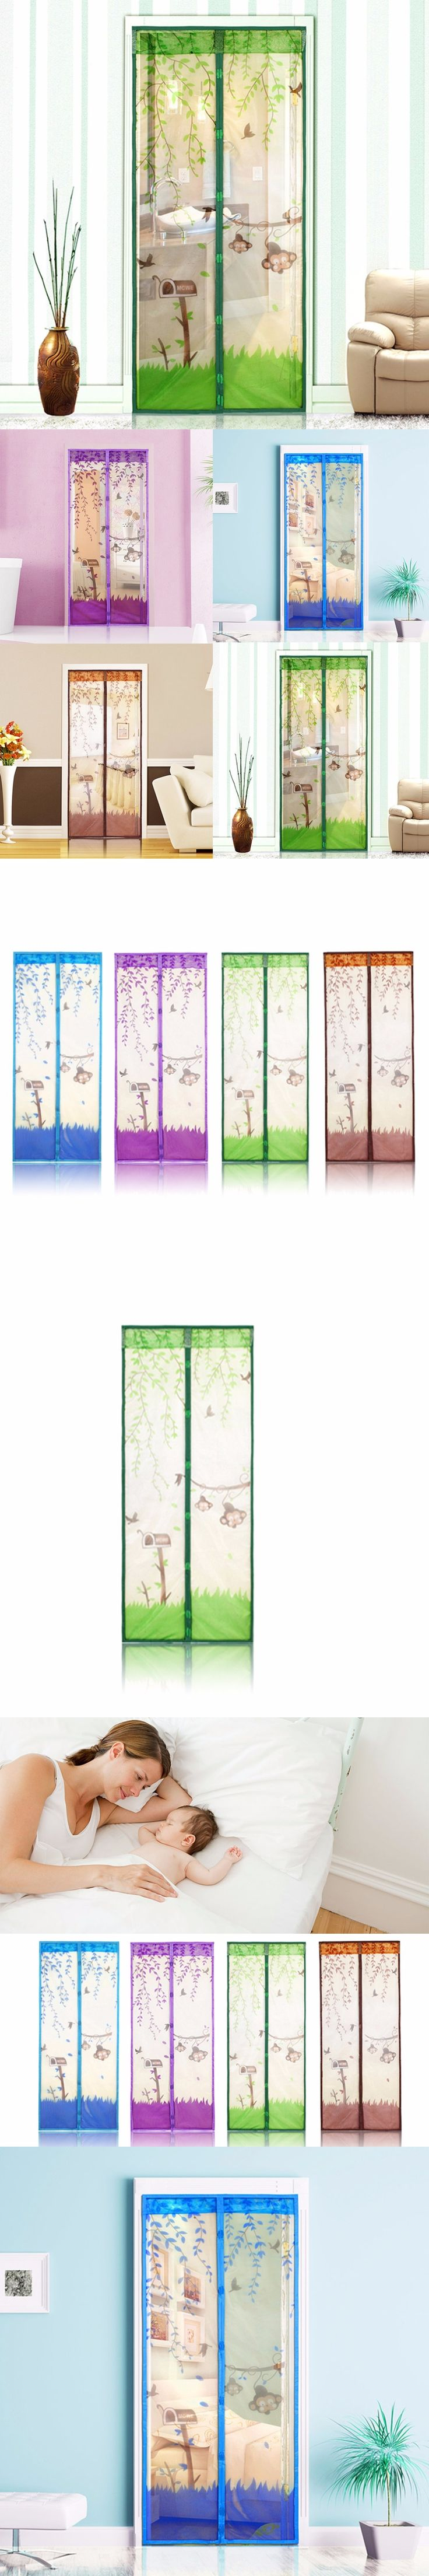 4 Colors Magnetic Mesh Screen Door Mosquito Net Curtain Protect Kitchen Window Organza Scree 90*210cm/100*210cm Drop Shipping